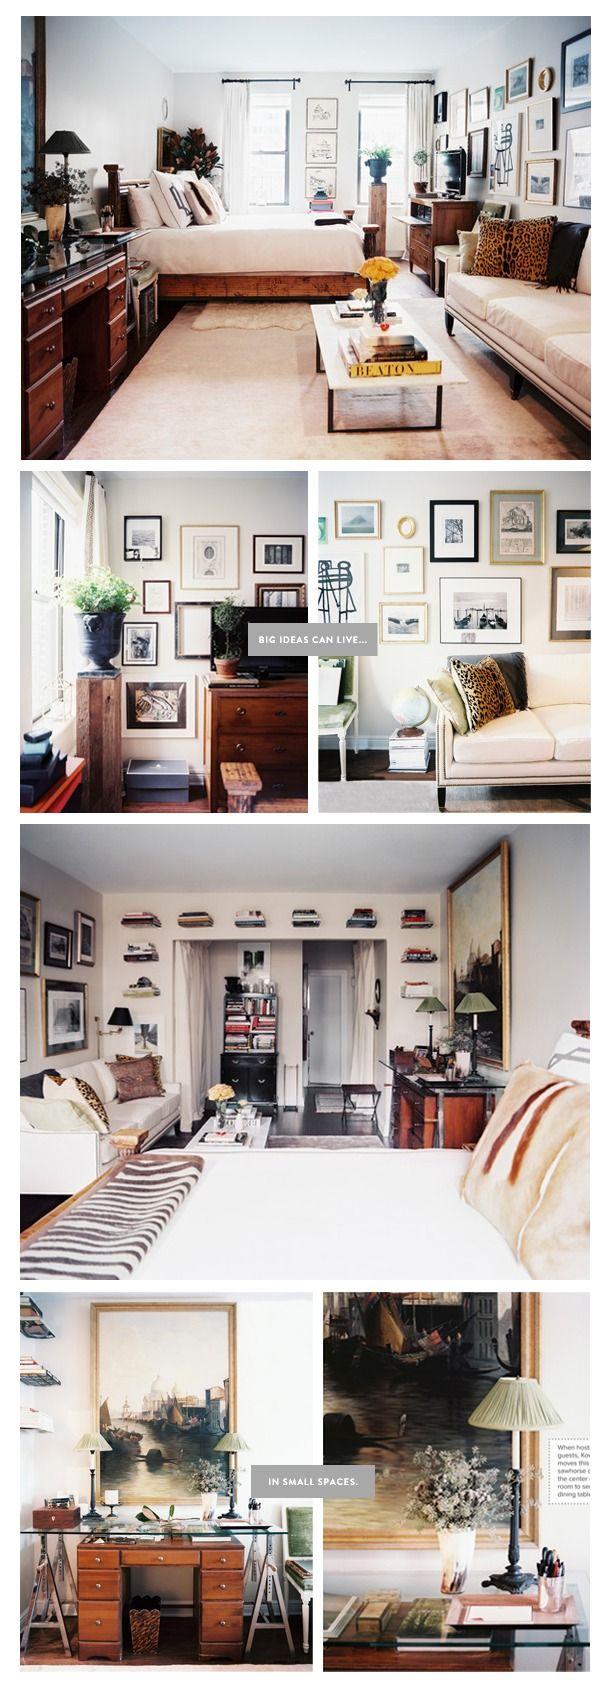 Best Studio Apartment Layout Design Ideas Images On Pinterest - Studio apartments design